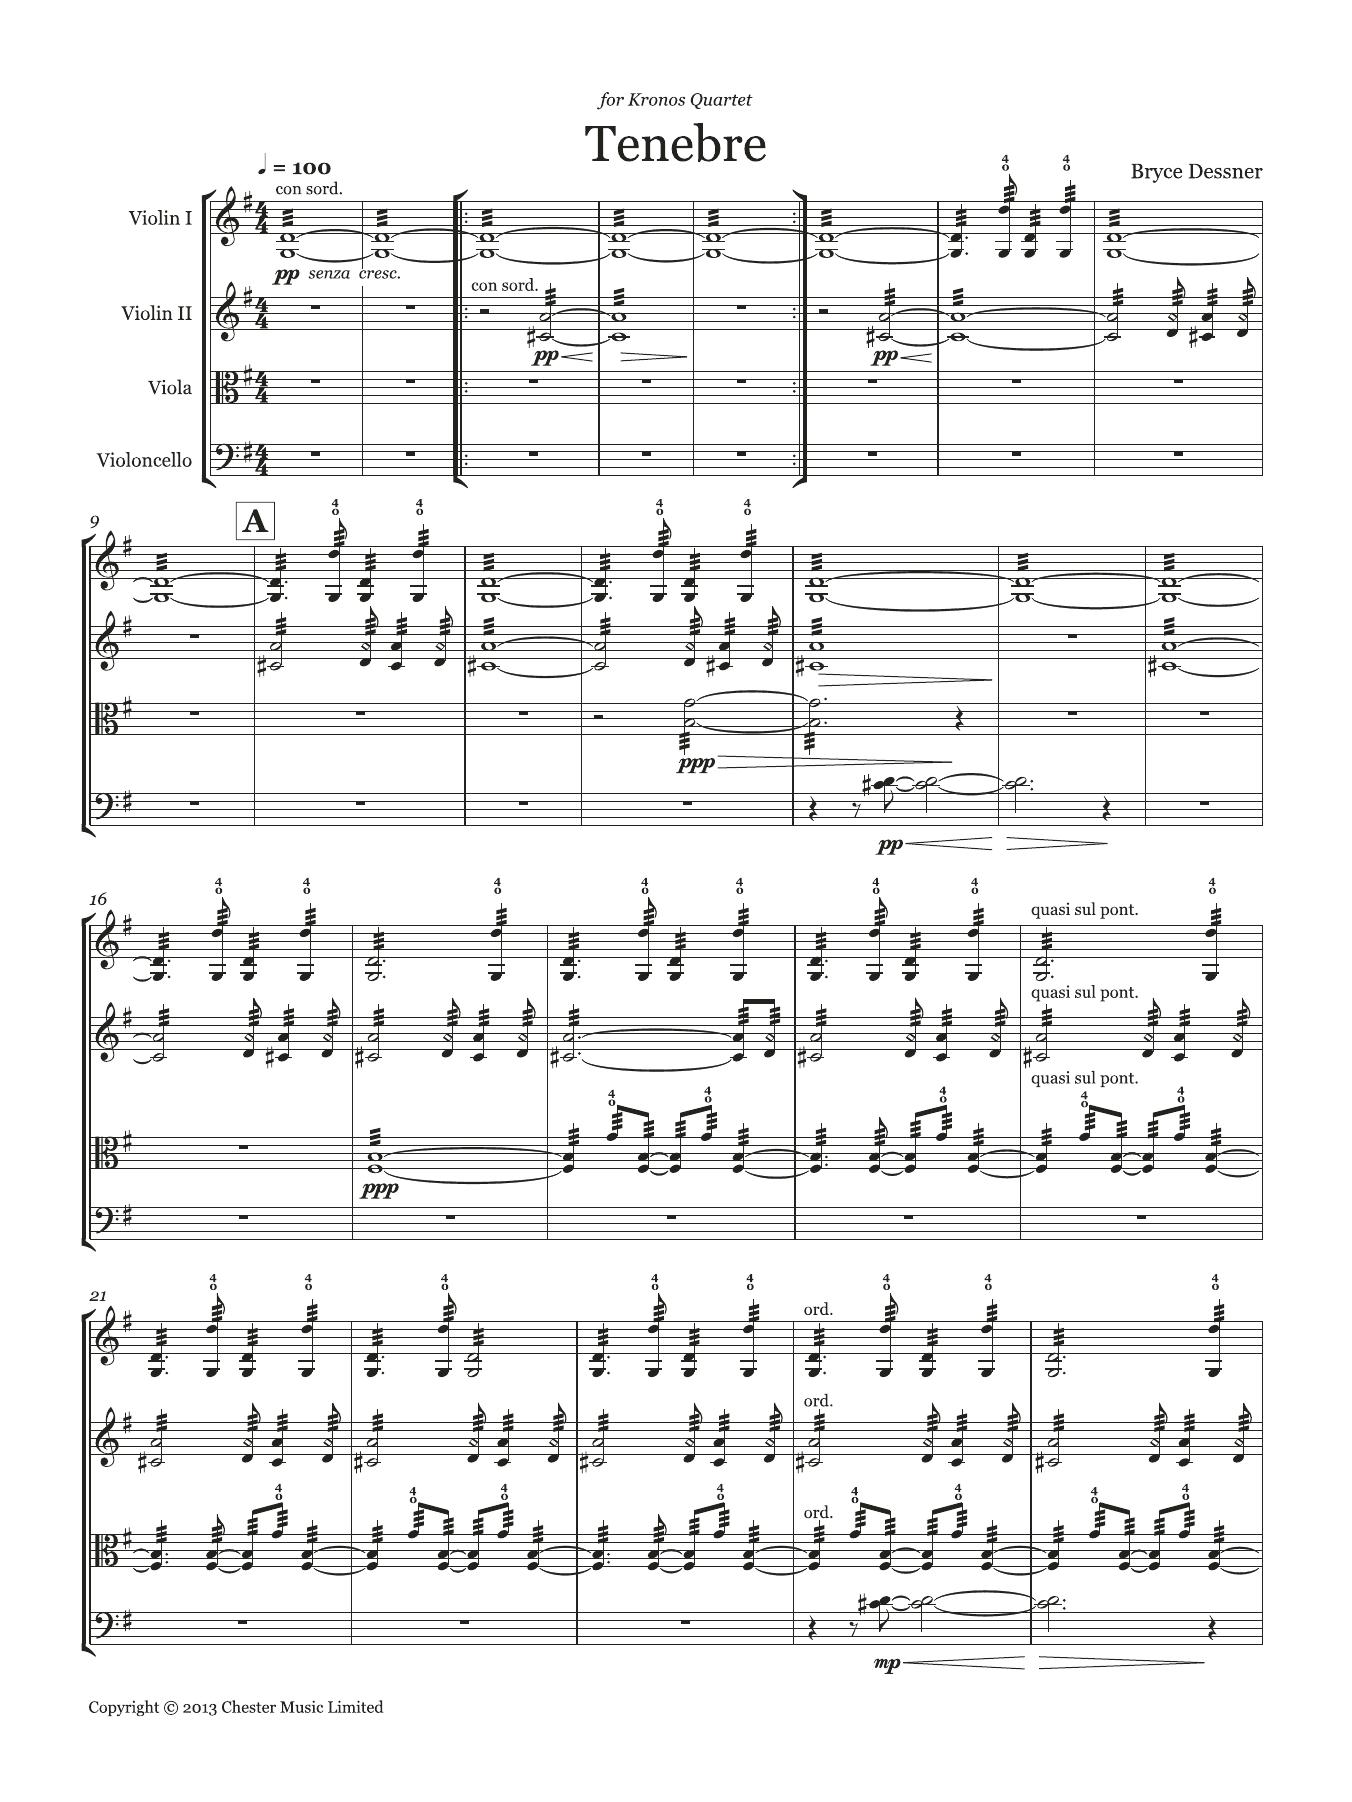 Bryce Dessner - Tenebre (String quartet score & parts)